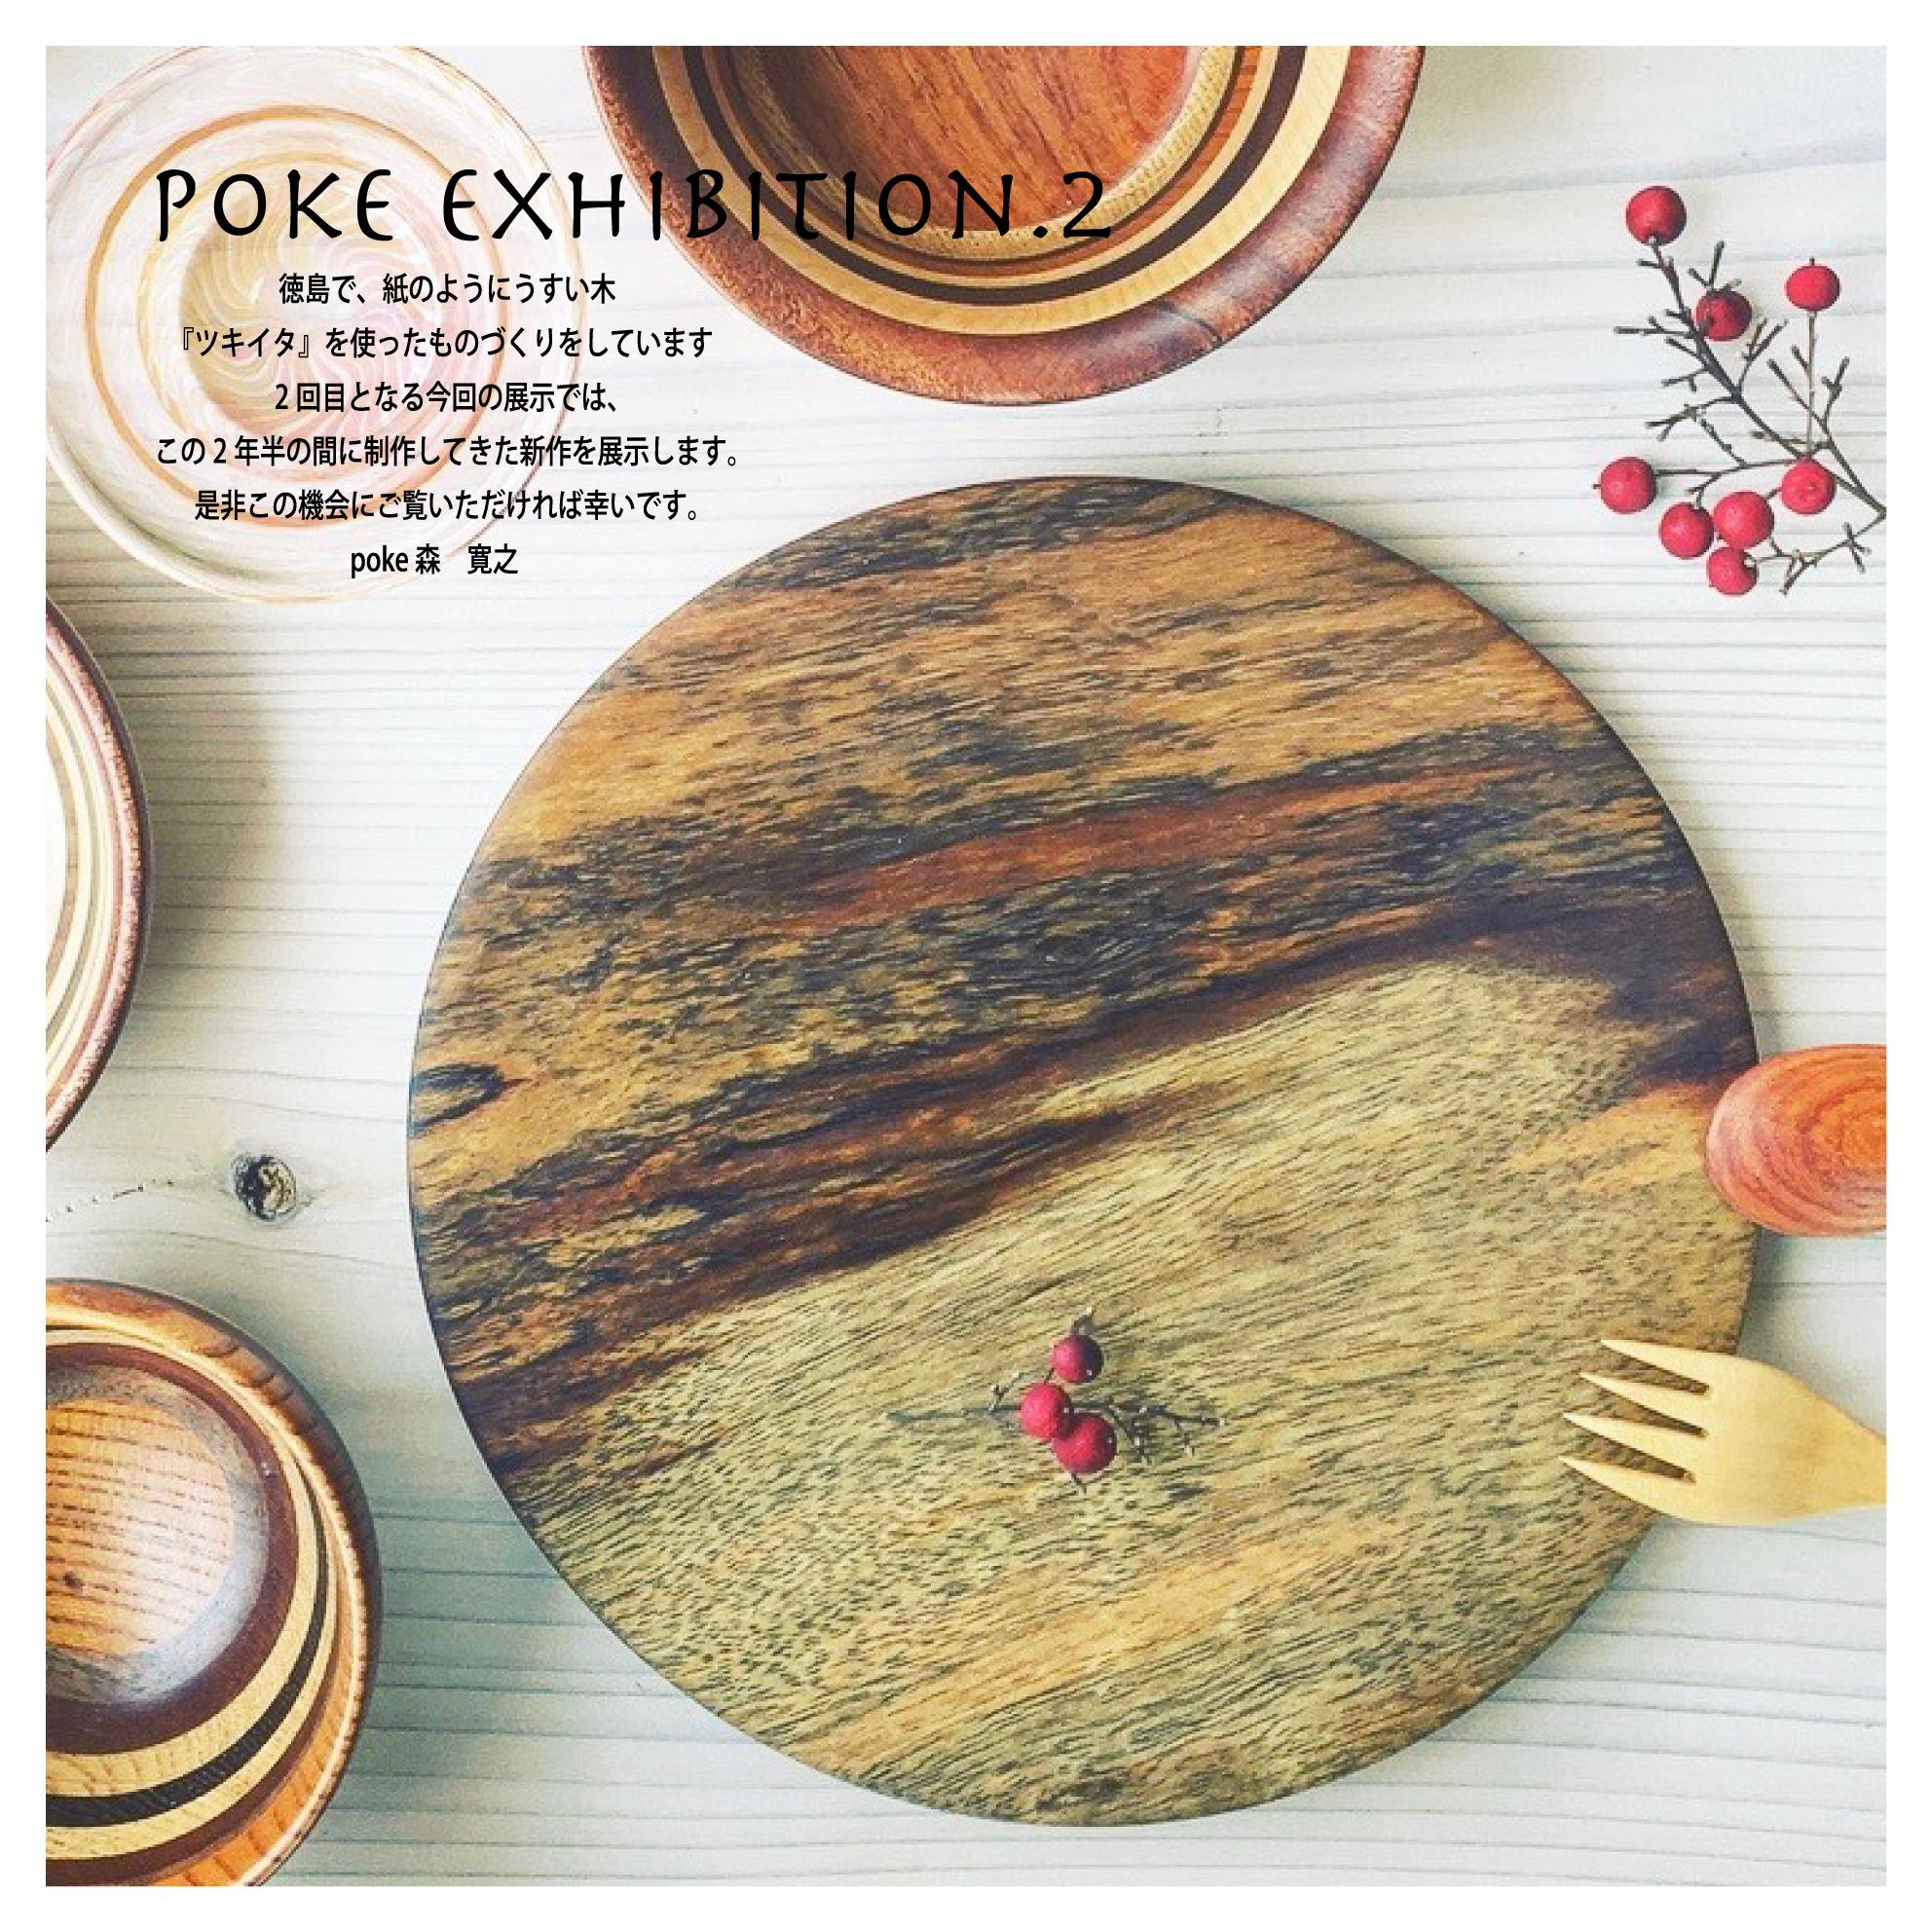 poke exhibition.2